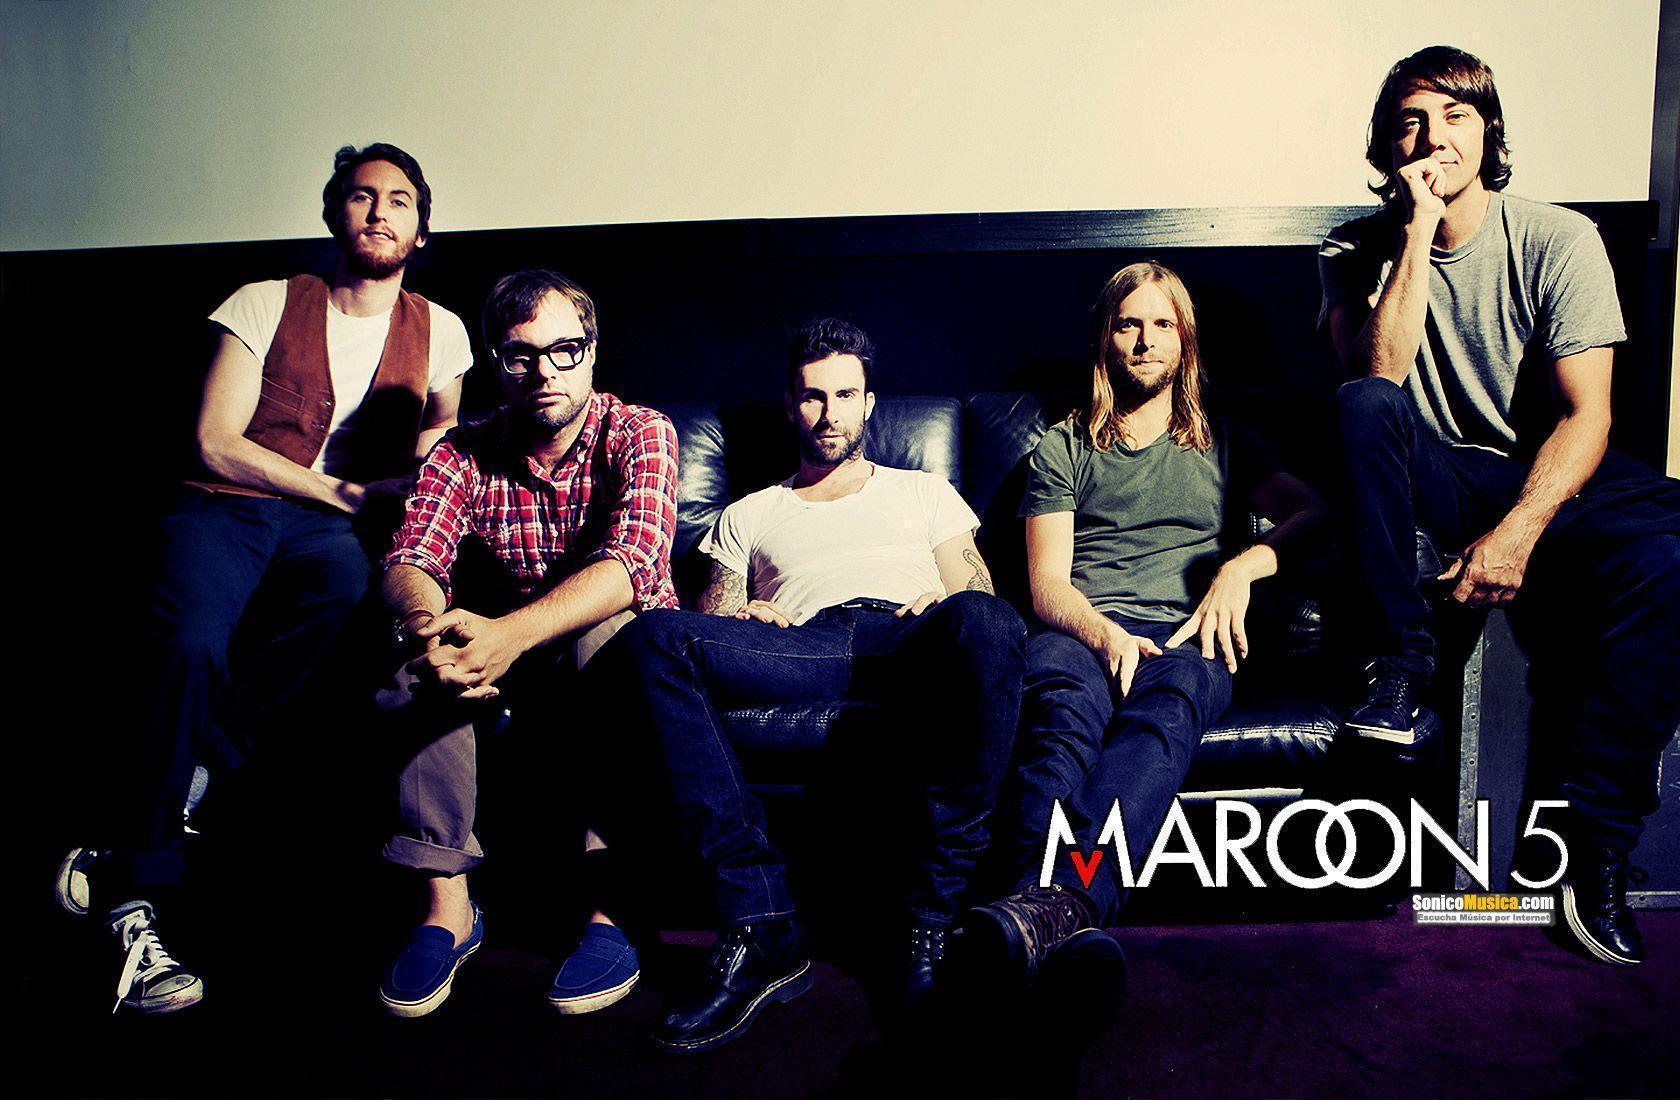 maroon 5 album discography download